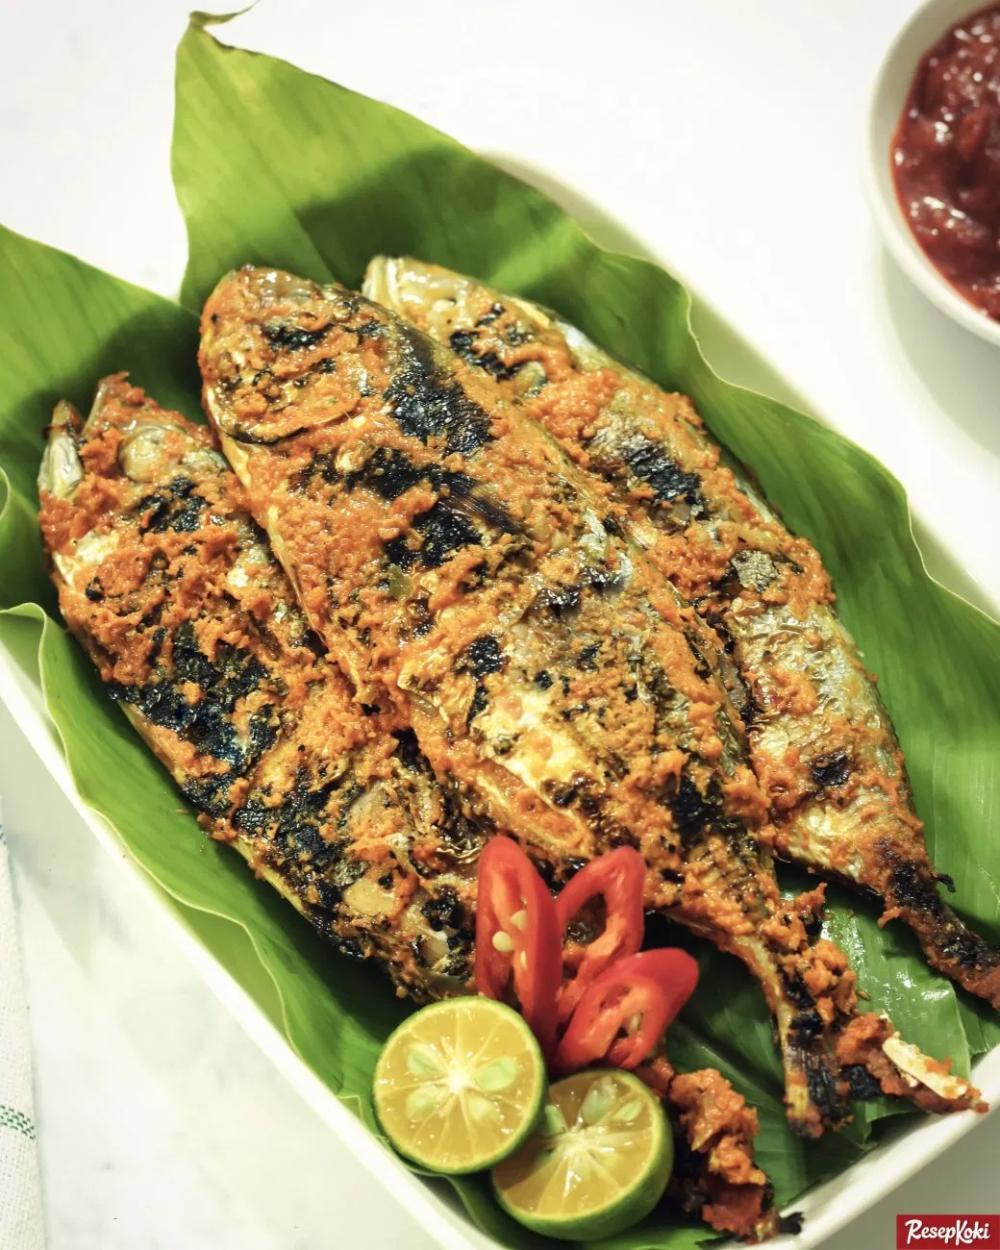 Azie Kitchen Telur Ikan Goreng Berempah Sedap Resep Masakan Malaysia Resep Masakan Asia Resep Makanan Asia